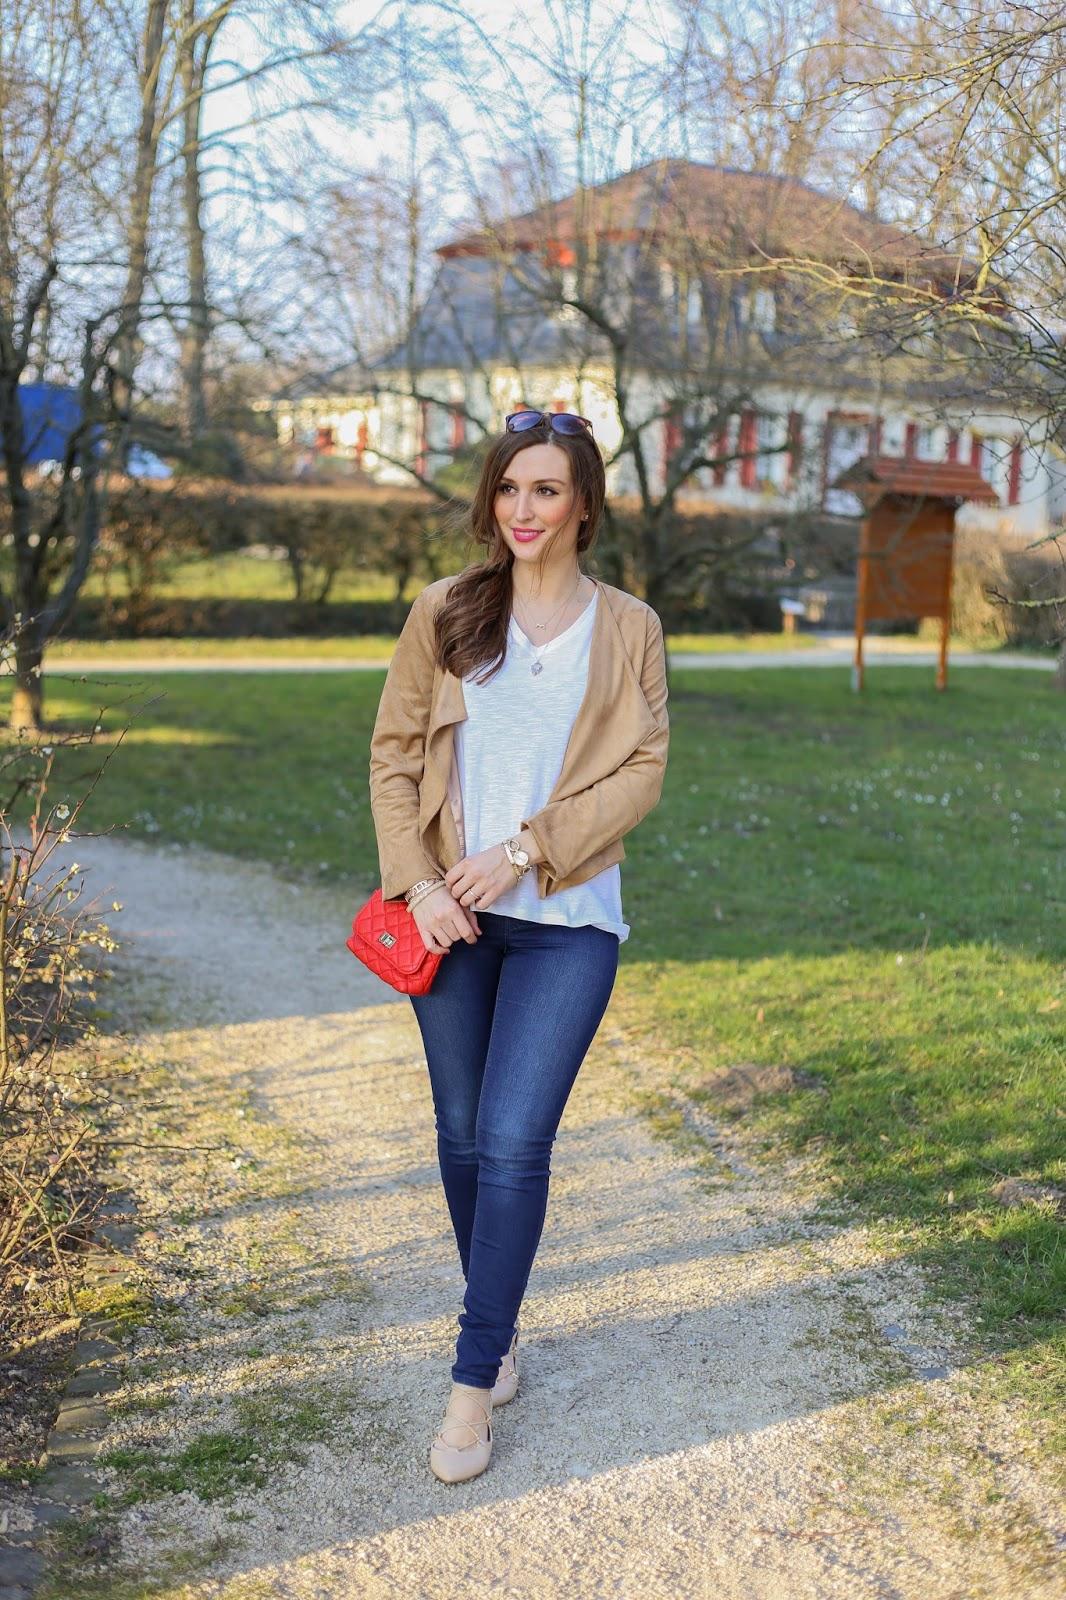 Fashionblogger aus Frankfurt - Fashionblog - Outfitinspiration Fashionblogger - Fashionistas - Lifestyleblogger - Outfitinspiration Fashionblogger - Rote Tasche Fashionblogger - Blogger aus Deutschland